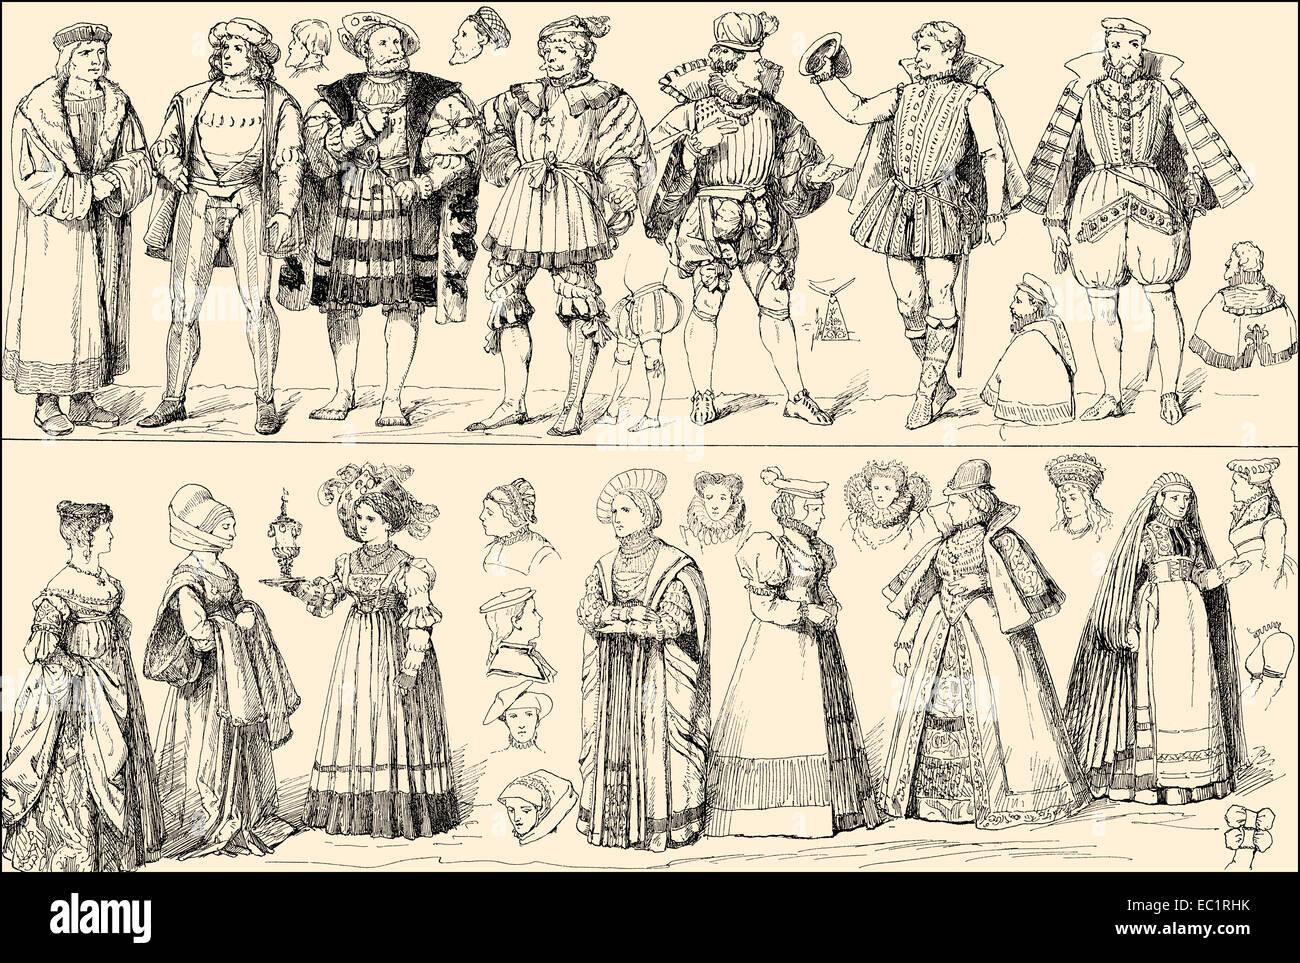 Kostüme aus dem 16. Jahrhundert, Deutschland Stockbild